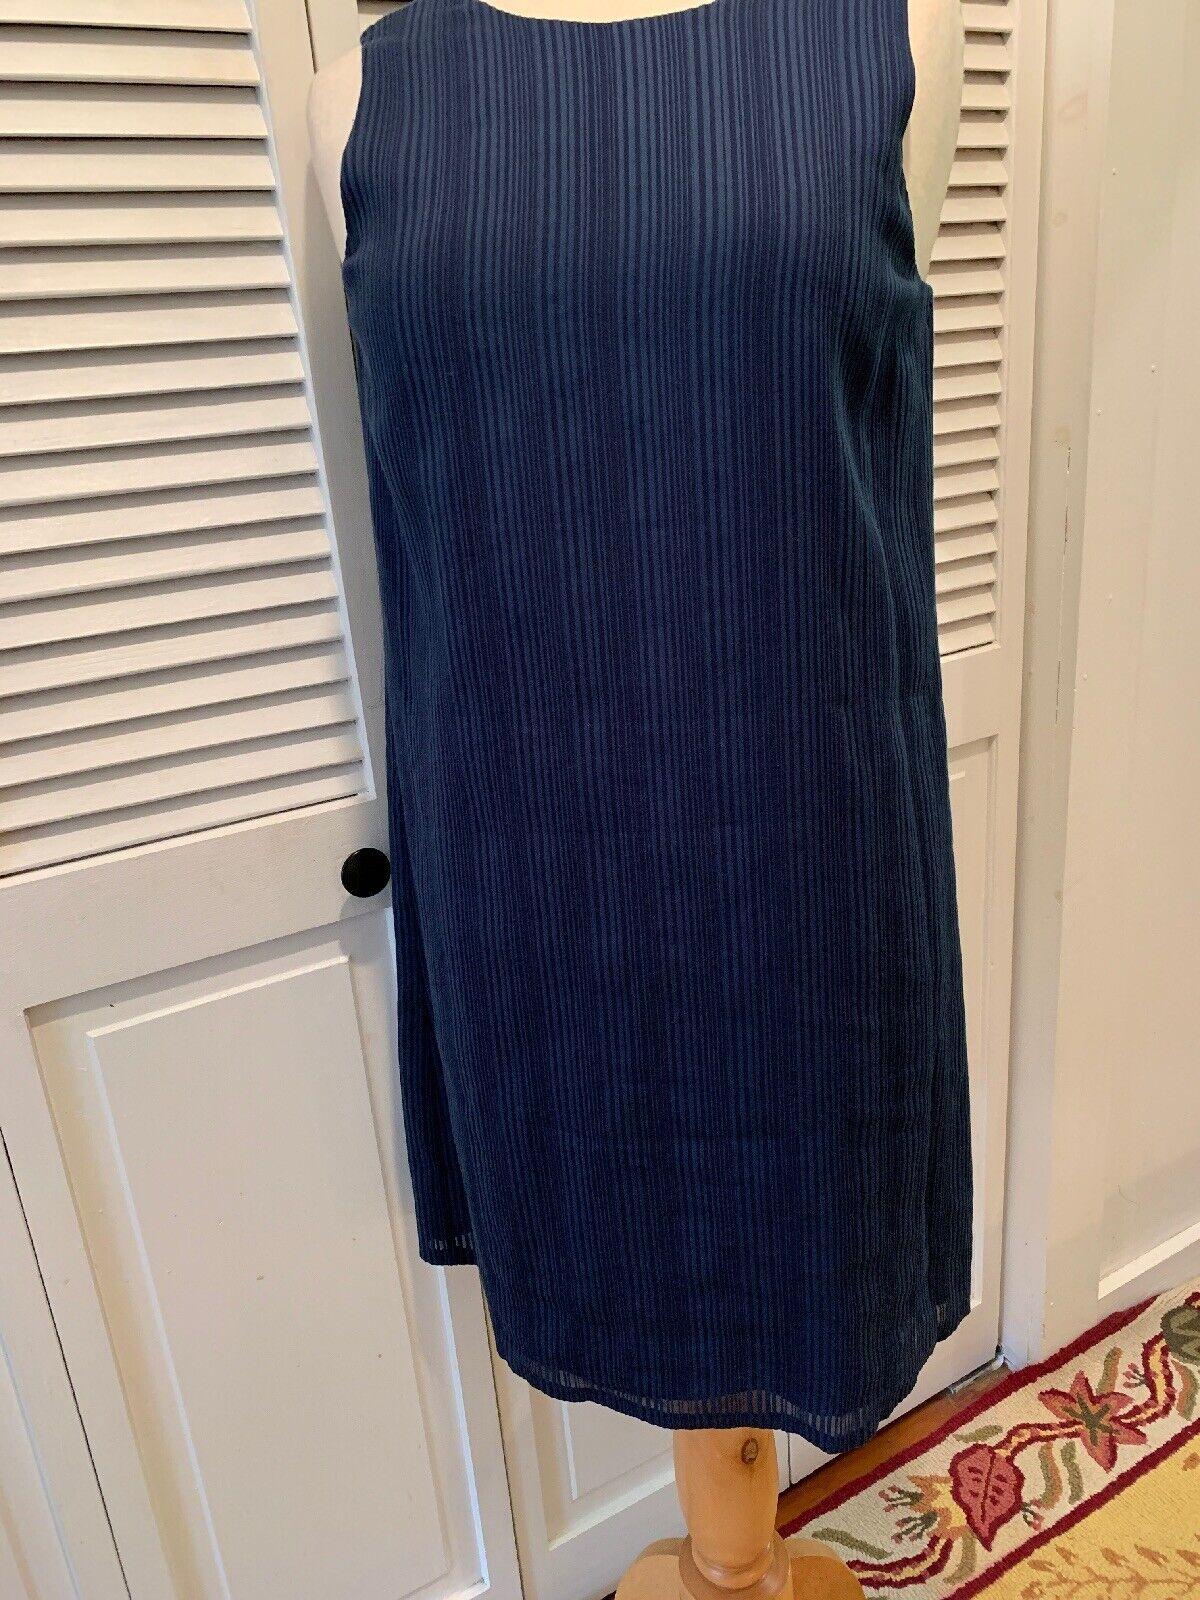 Theory dress Brindina Cl Behemi Navy Shift Größe 4 NWOT Lined Back Zip &hook